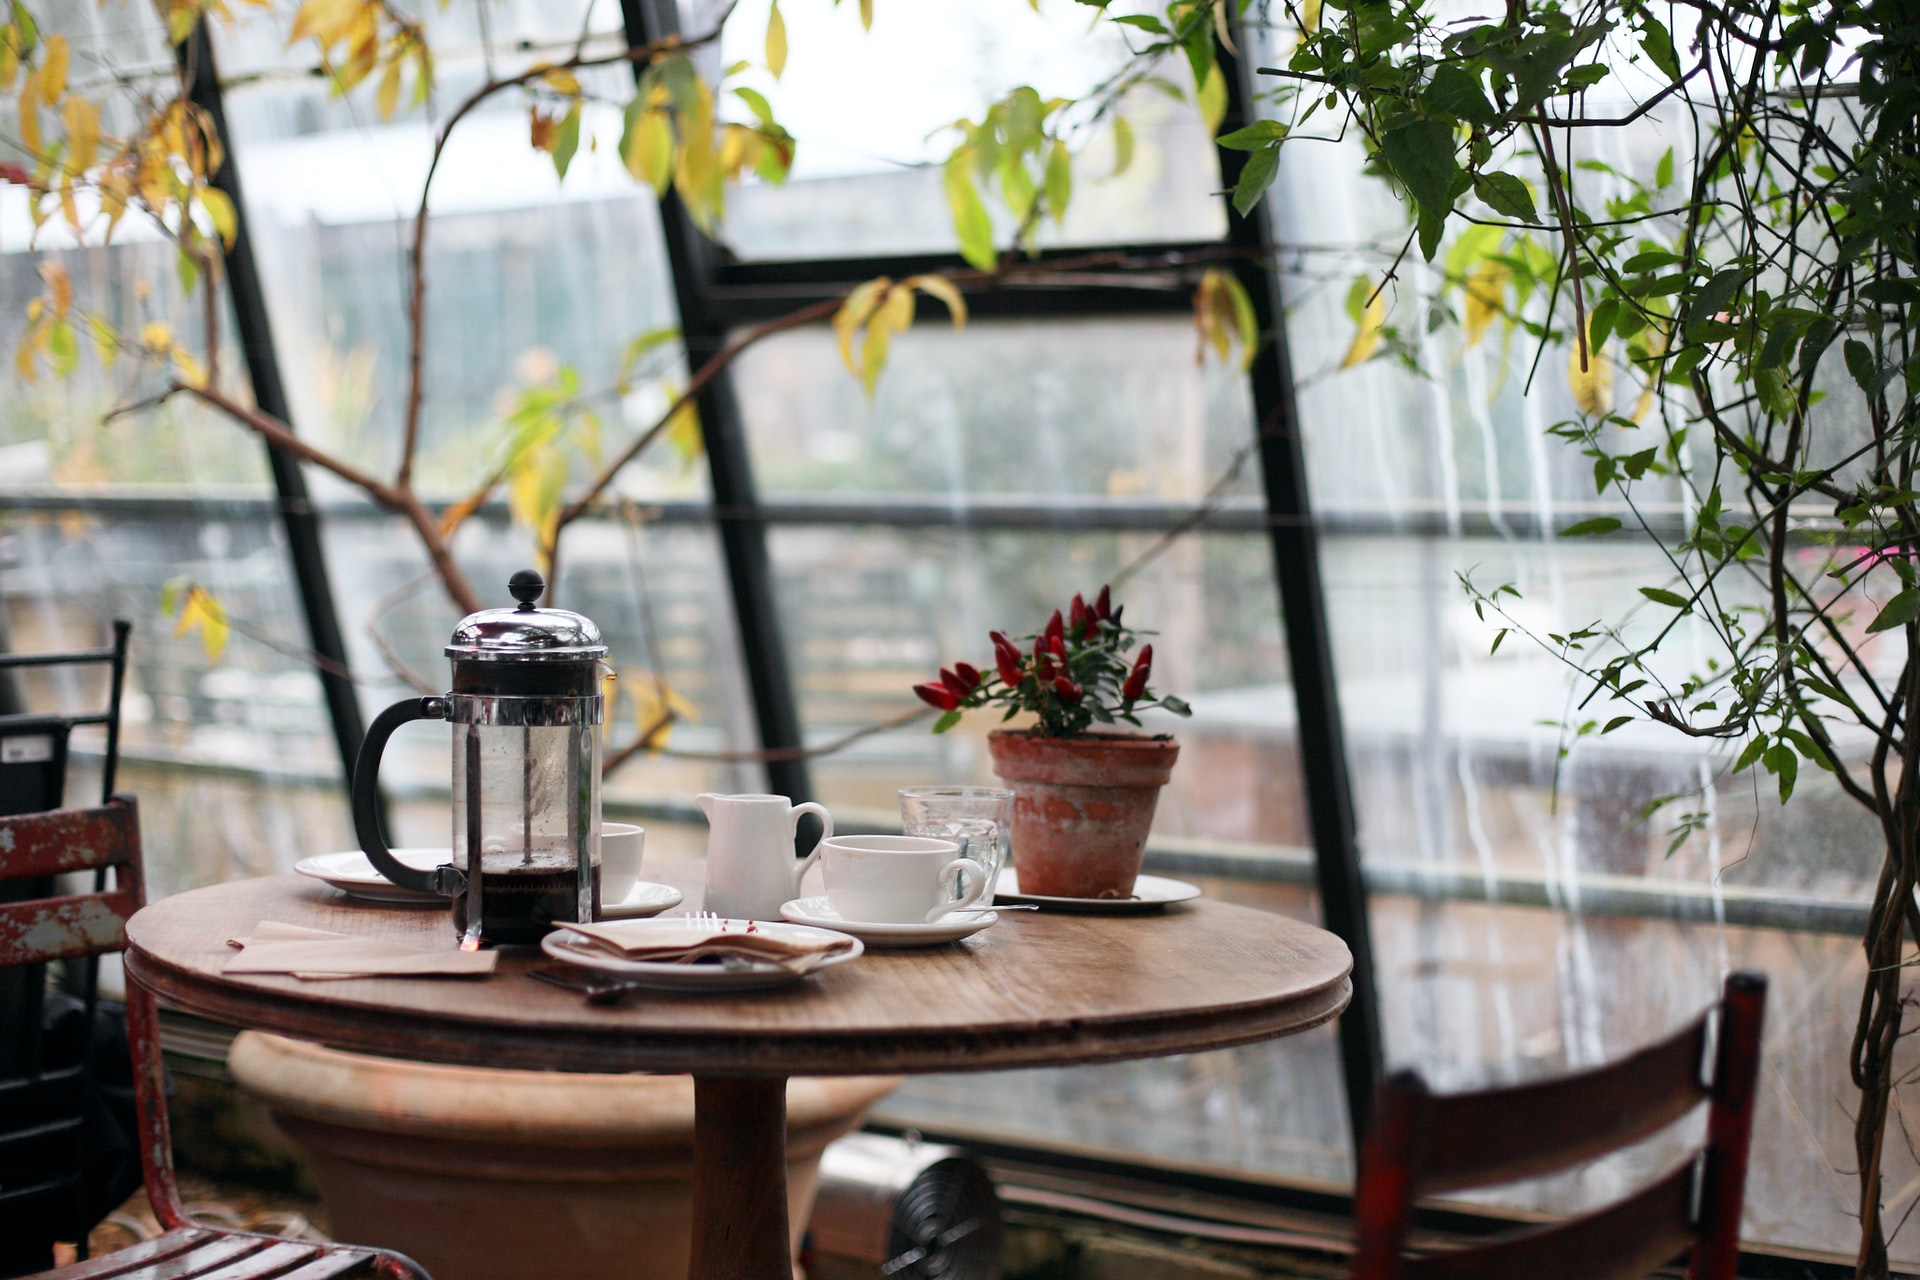 Coffee in a café. Image by @krisatomic via Unsplash